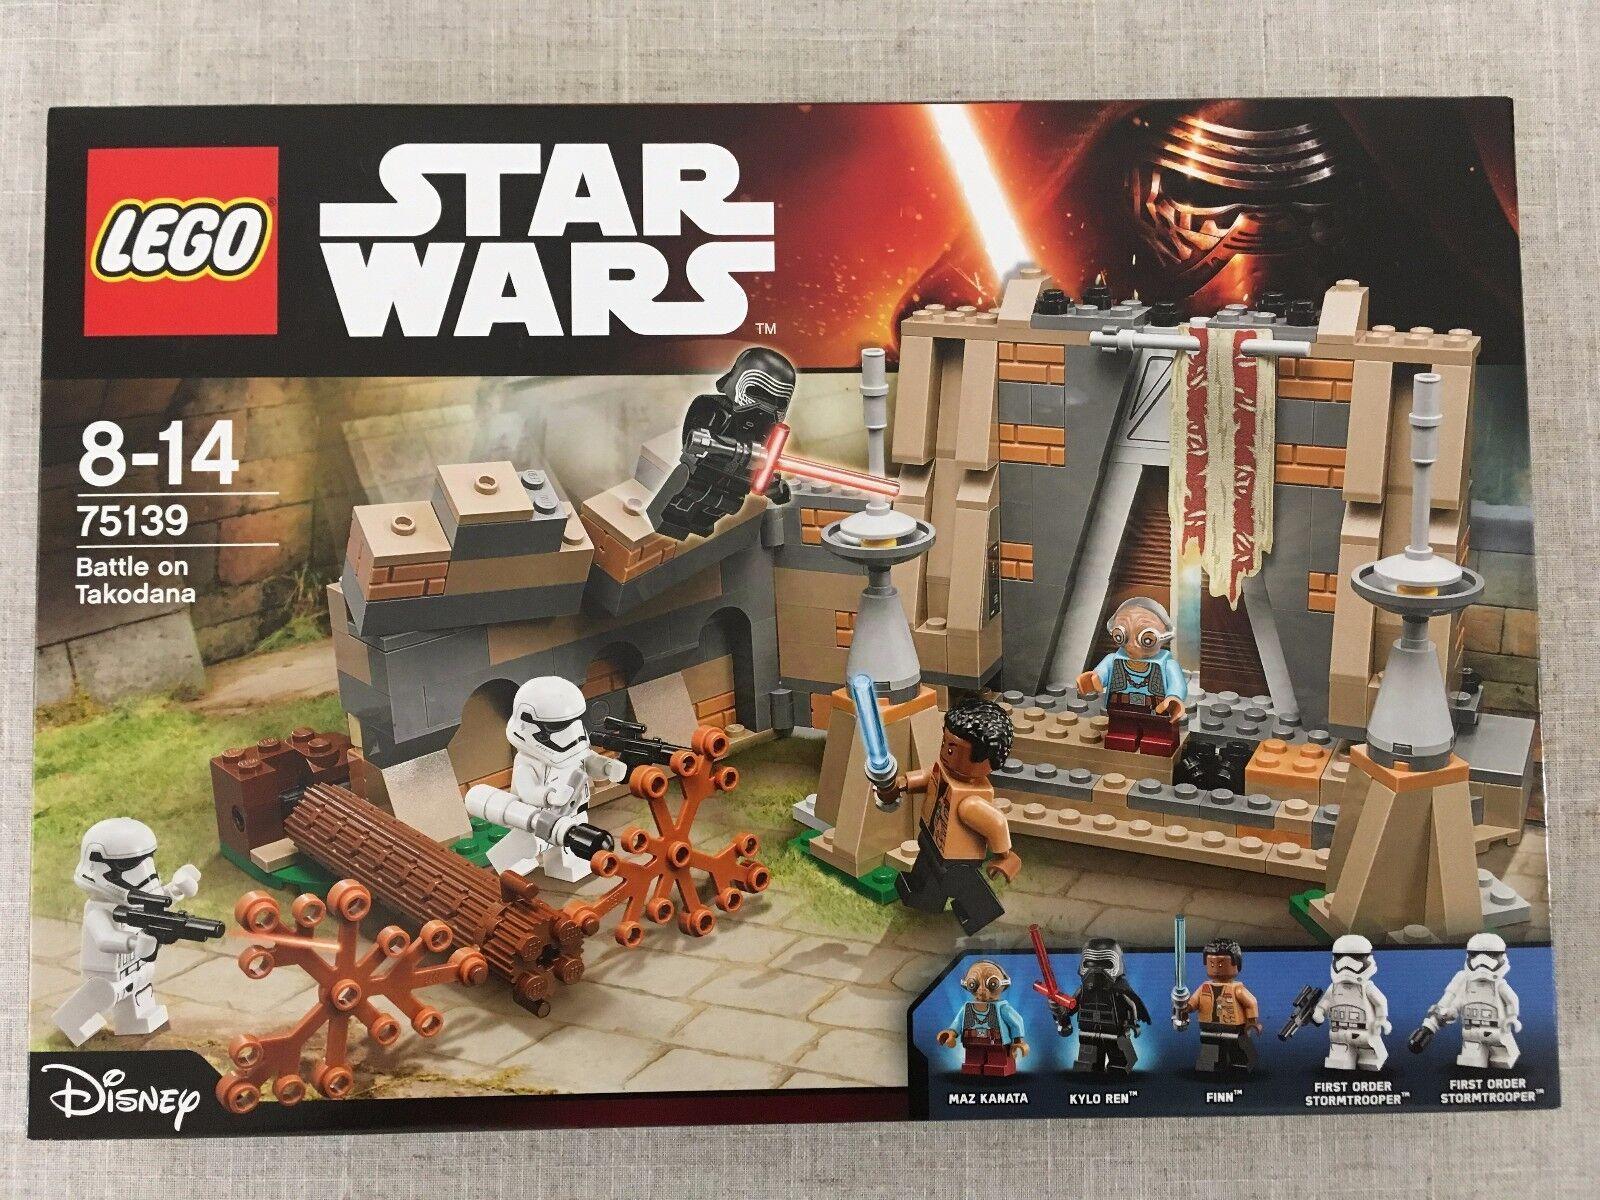 LEGO Star Wars The Force Awakens Battle On Takodana (75139) New/Sealed